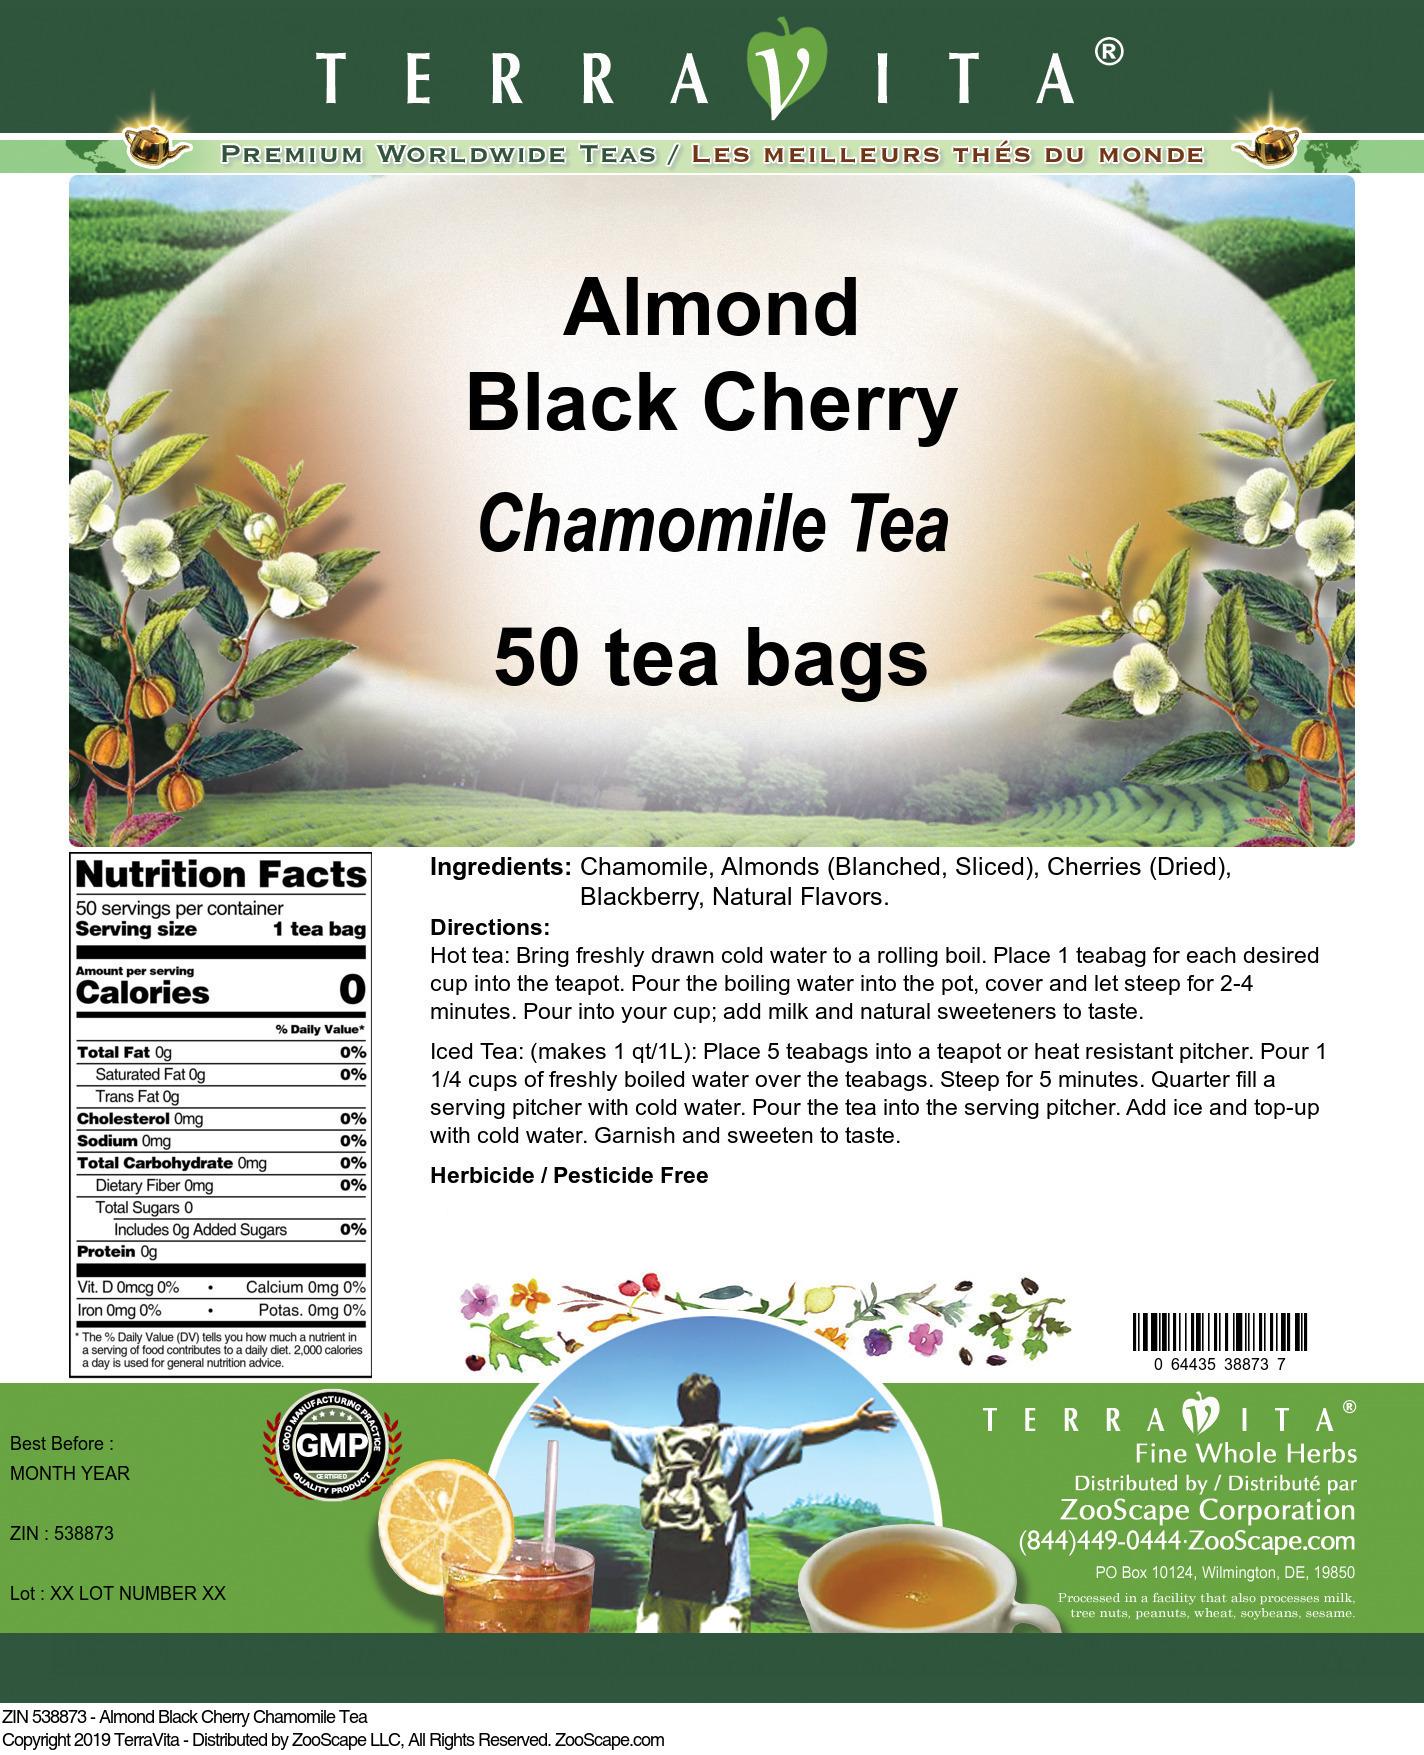 Almond Black Cherry Chamomile Tea